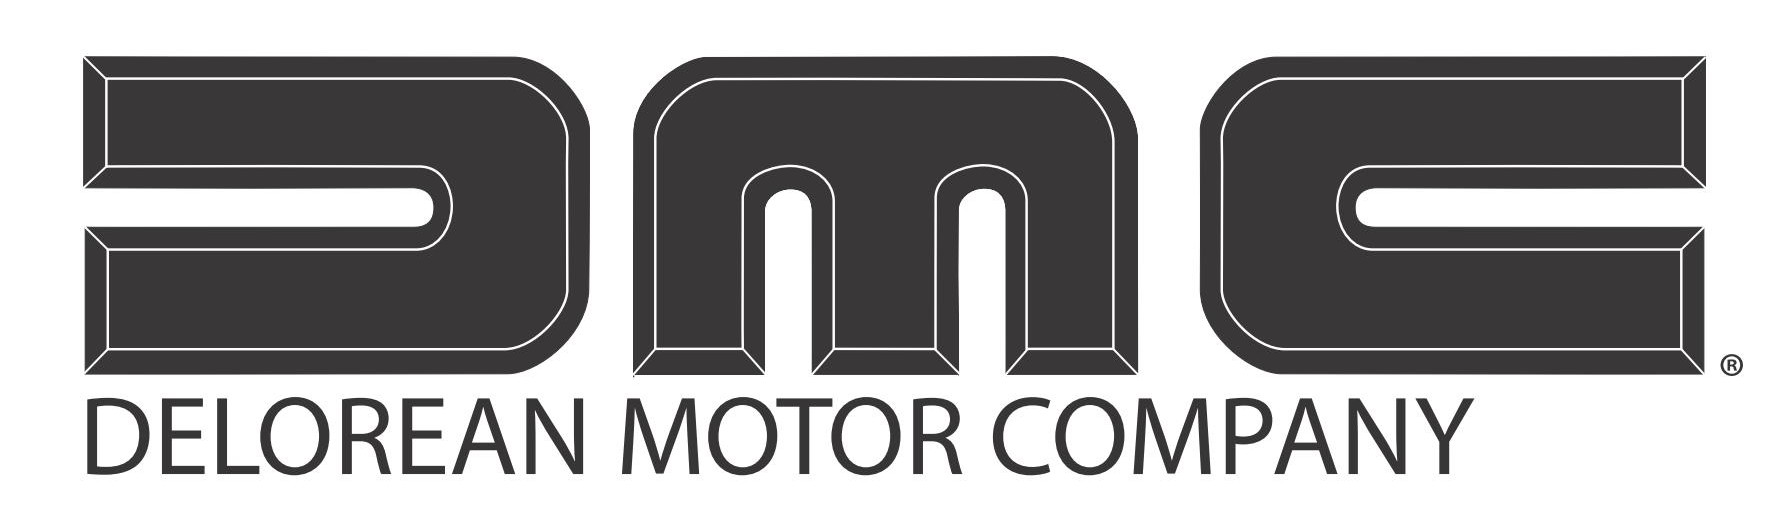 DeLorean Motor Company Logo png